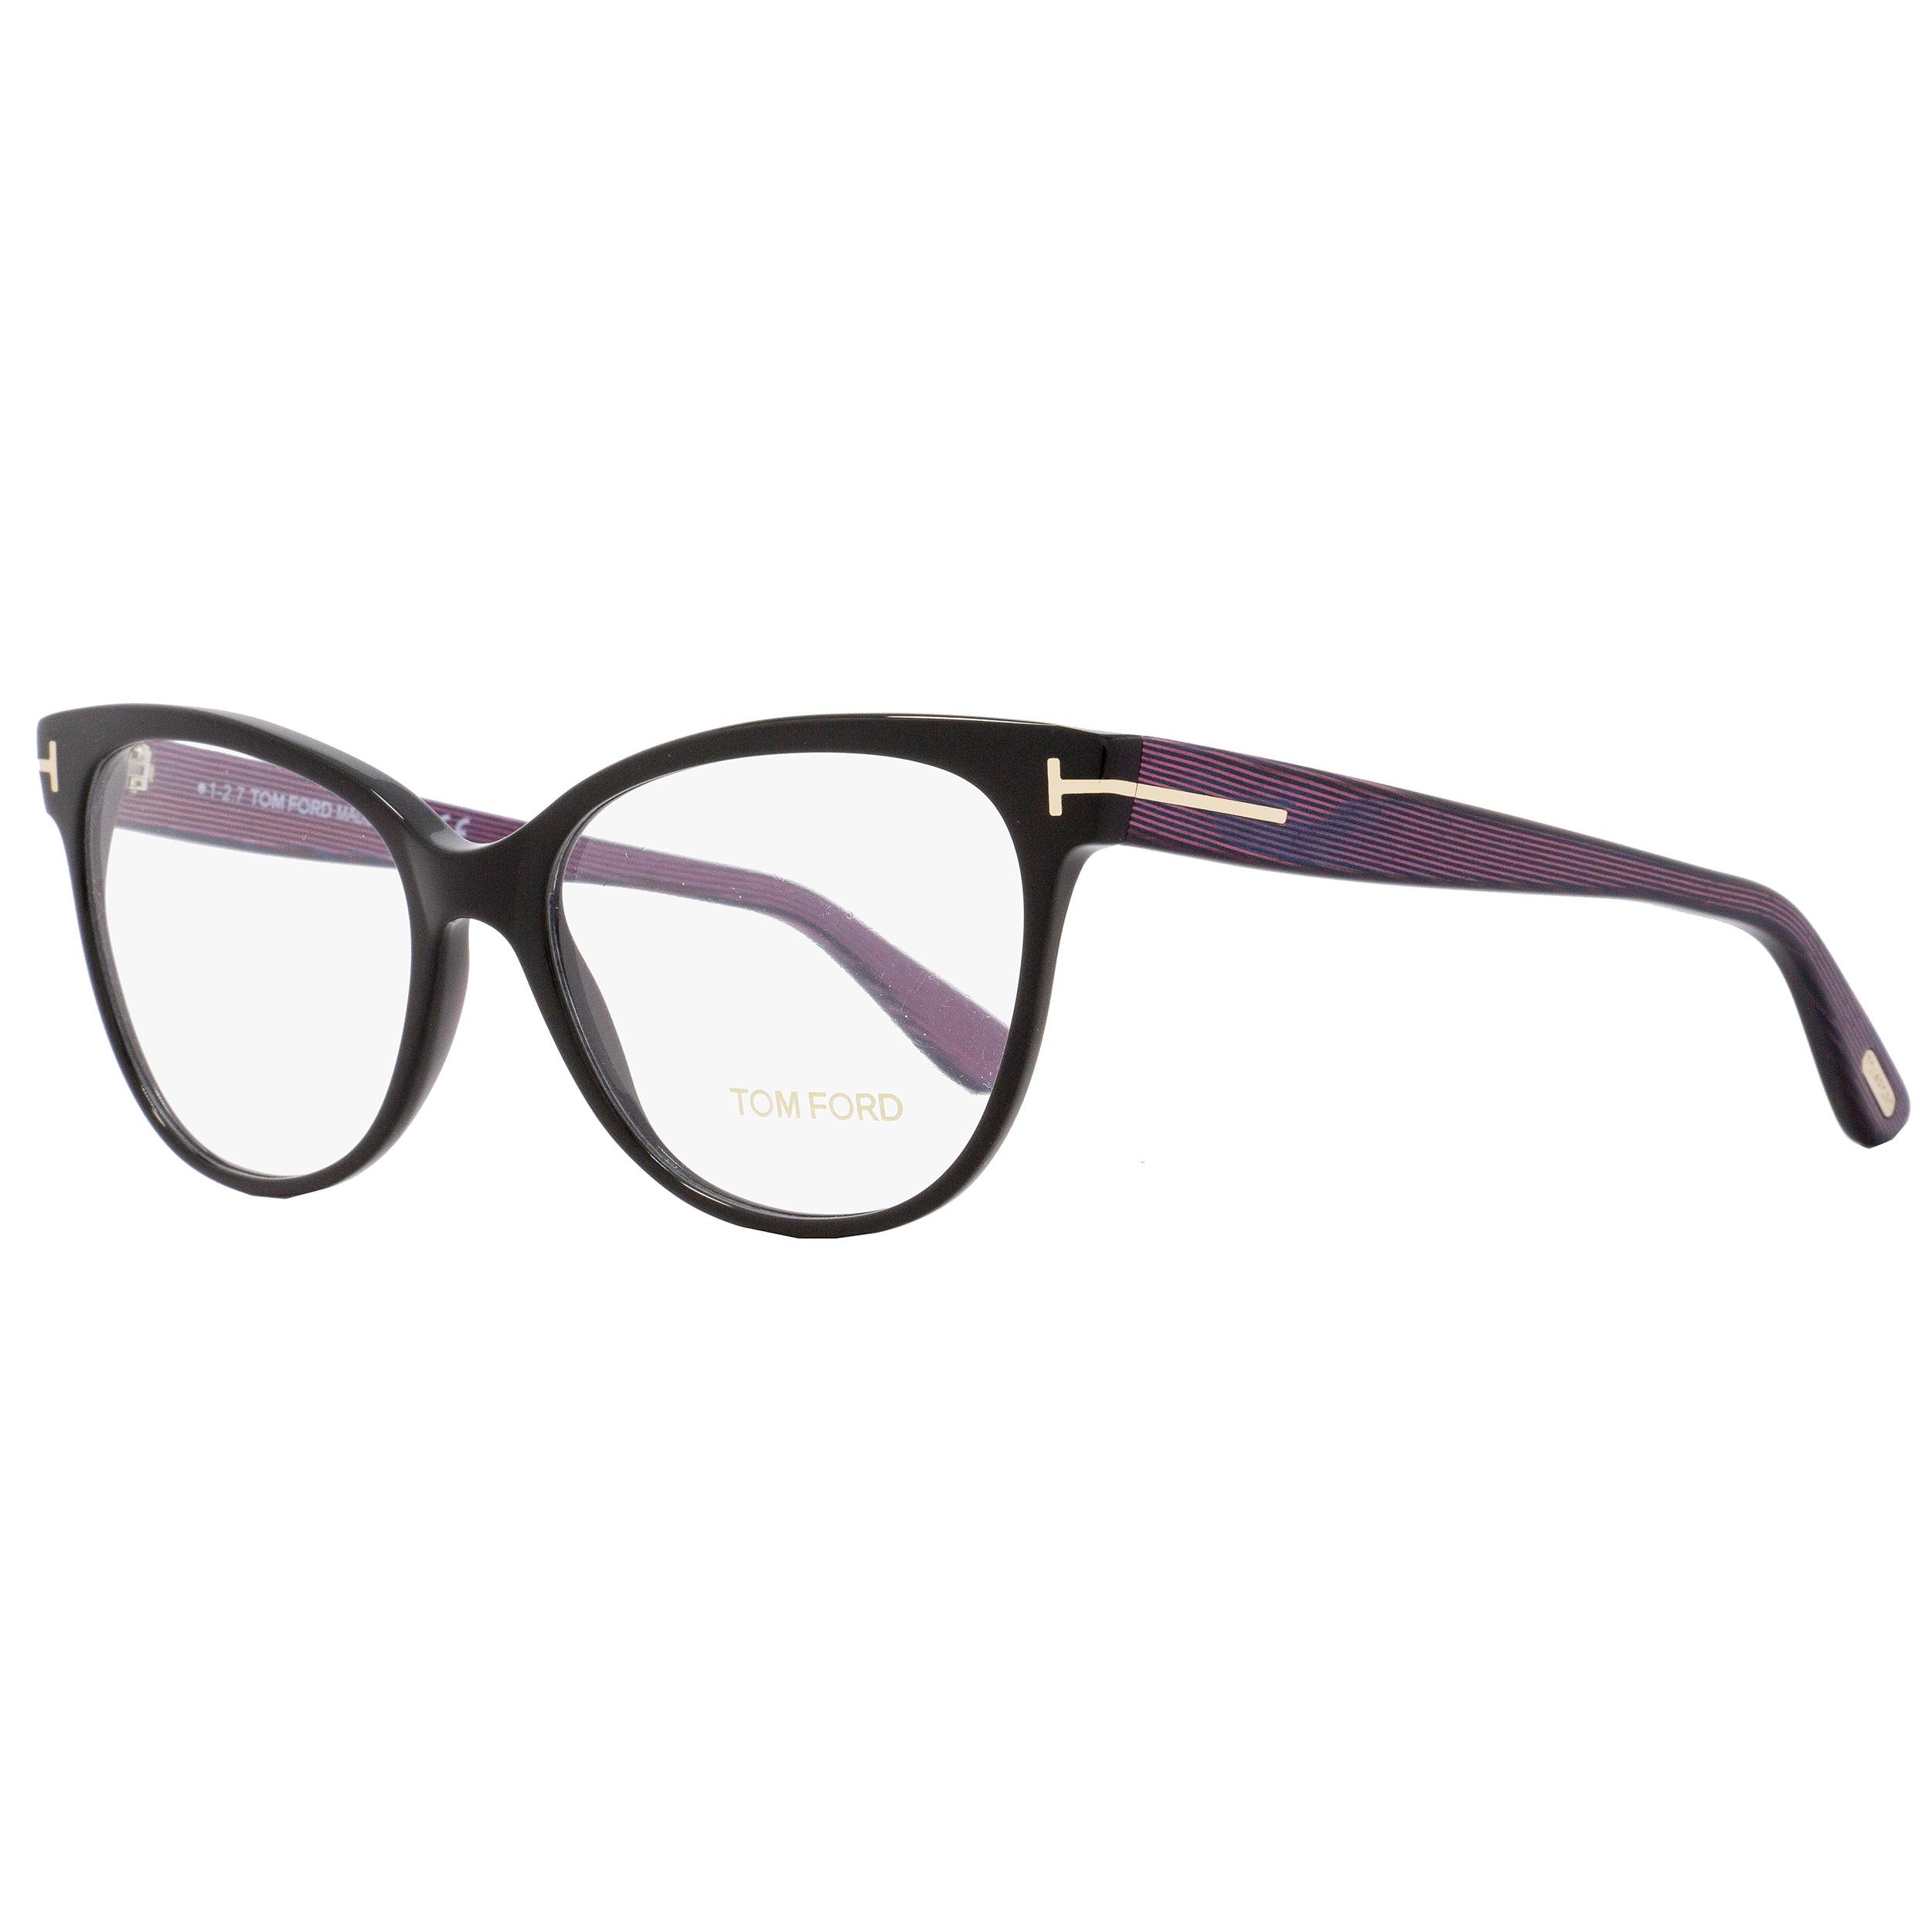 b55fc1f90cc94 Shop Tom Ford TF5291 005 Womens Black Iridescent Chalkstripe 55 mm  Eyeglasses - Free Shipping Today - Overstock.com - 18778813